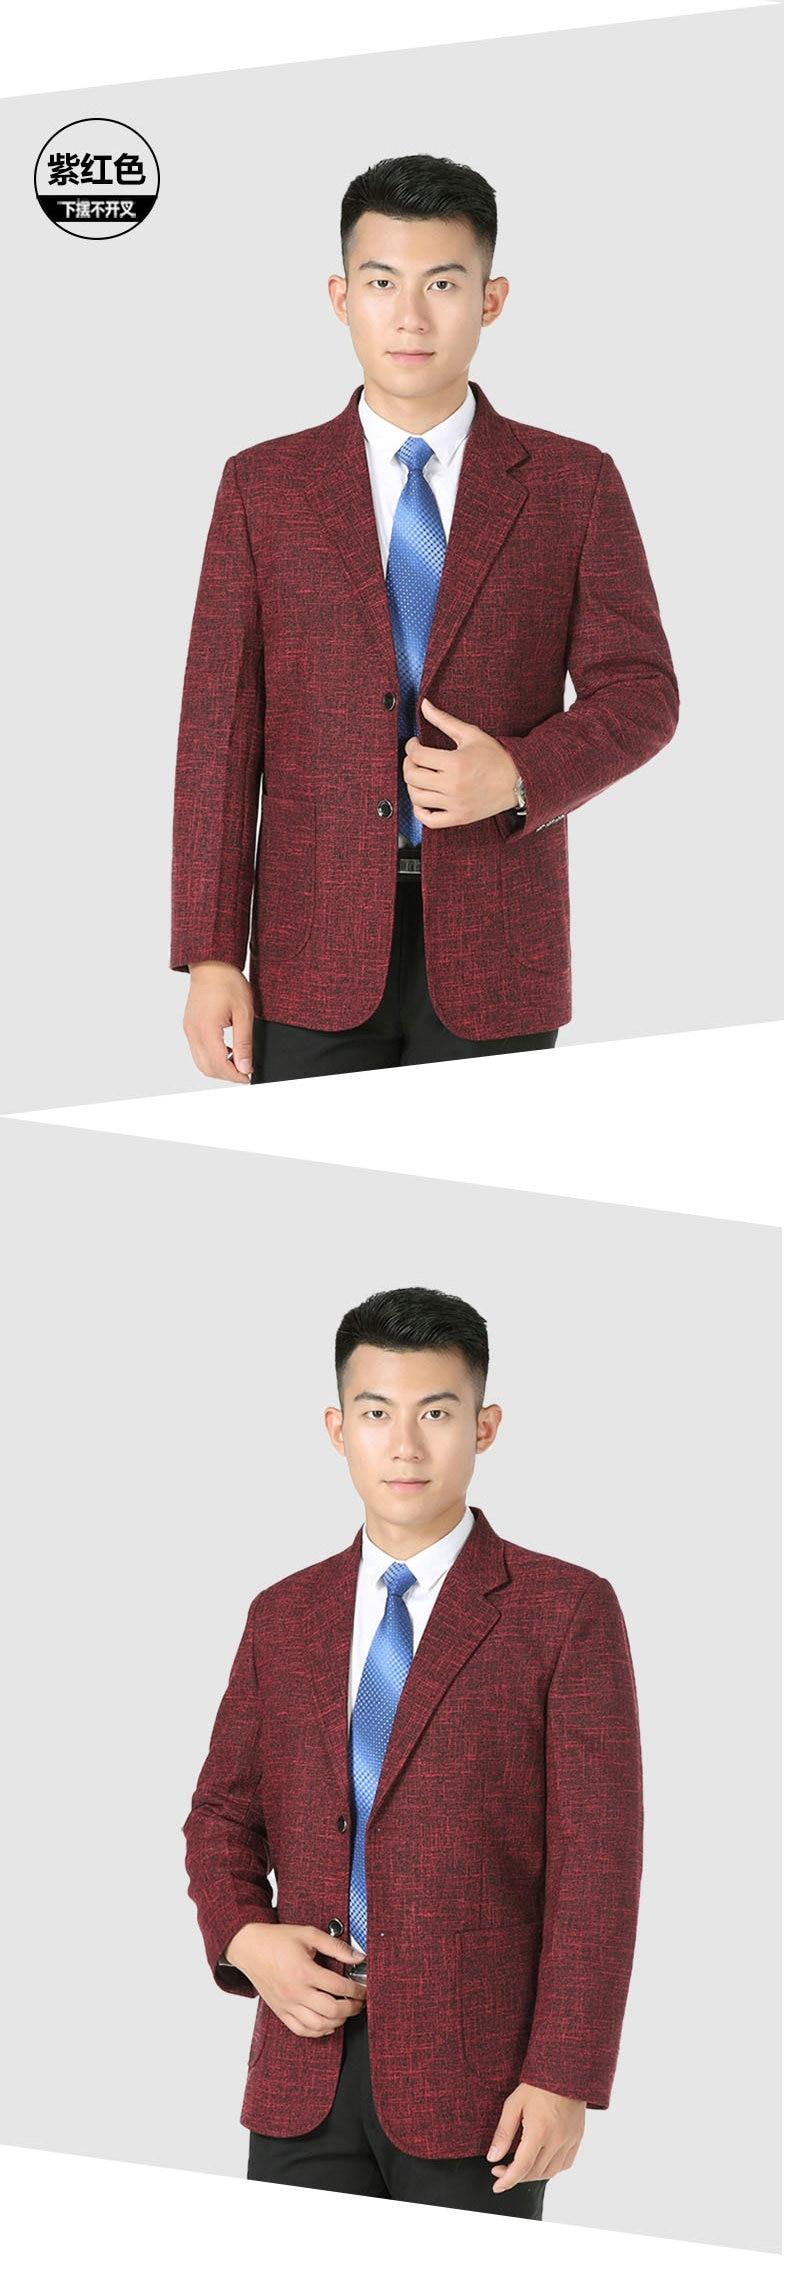 WAEOLSA Men Elegance Blazers Gray Red Khaki Suit Jackets Man Notched Collar Outfits Business Casual Blazer Male Office Suit Jacket Plus Size Wear (7)